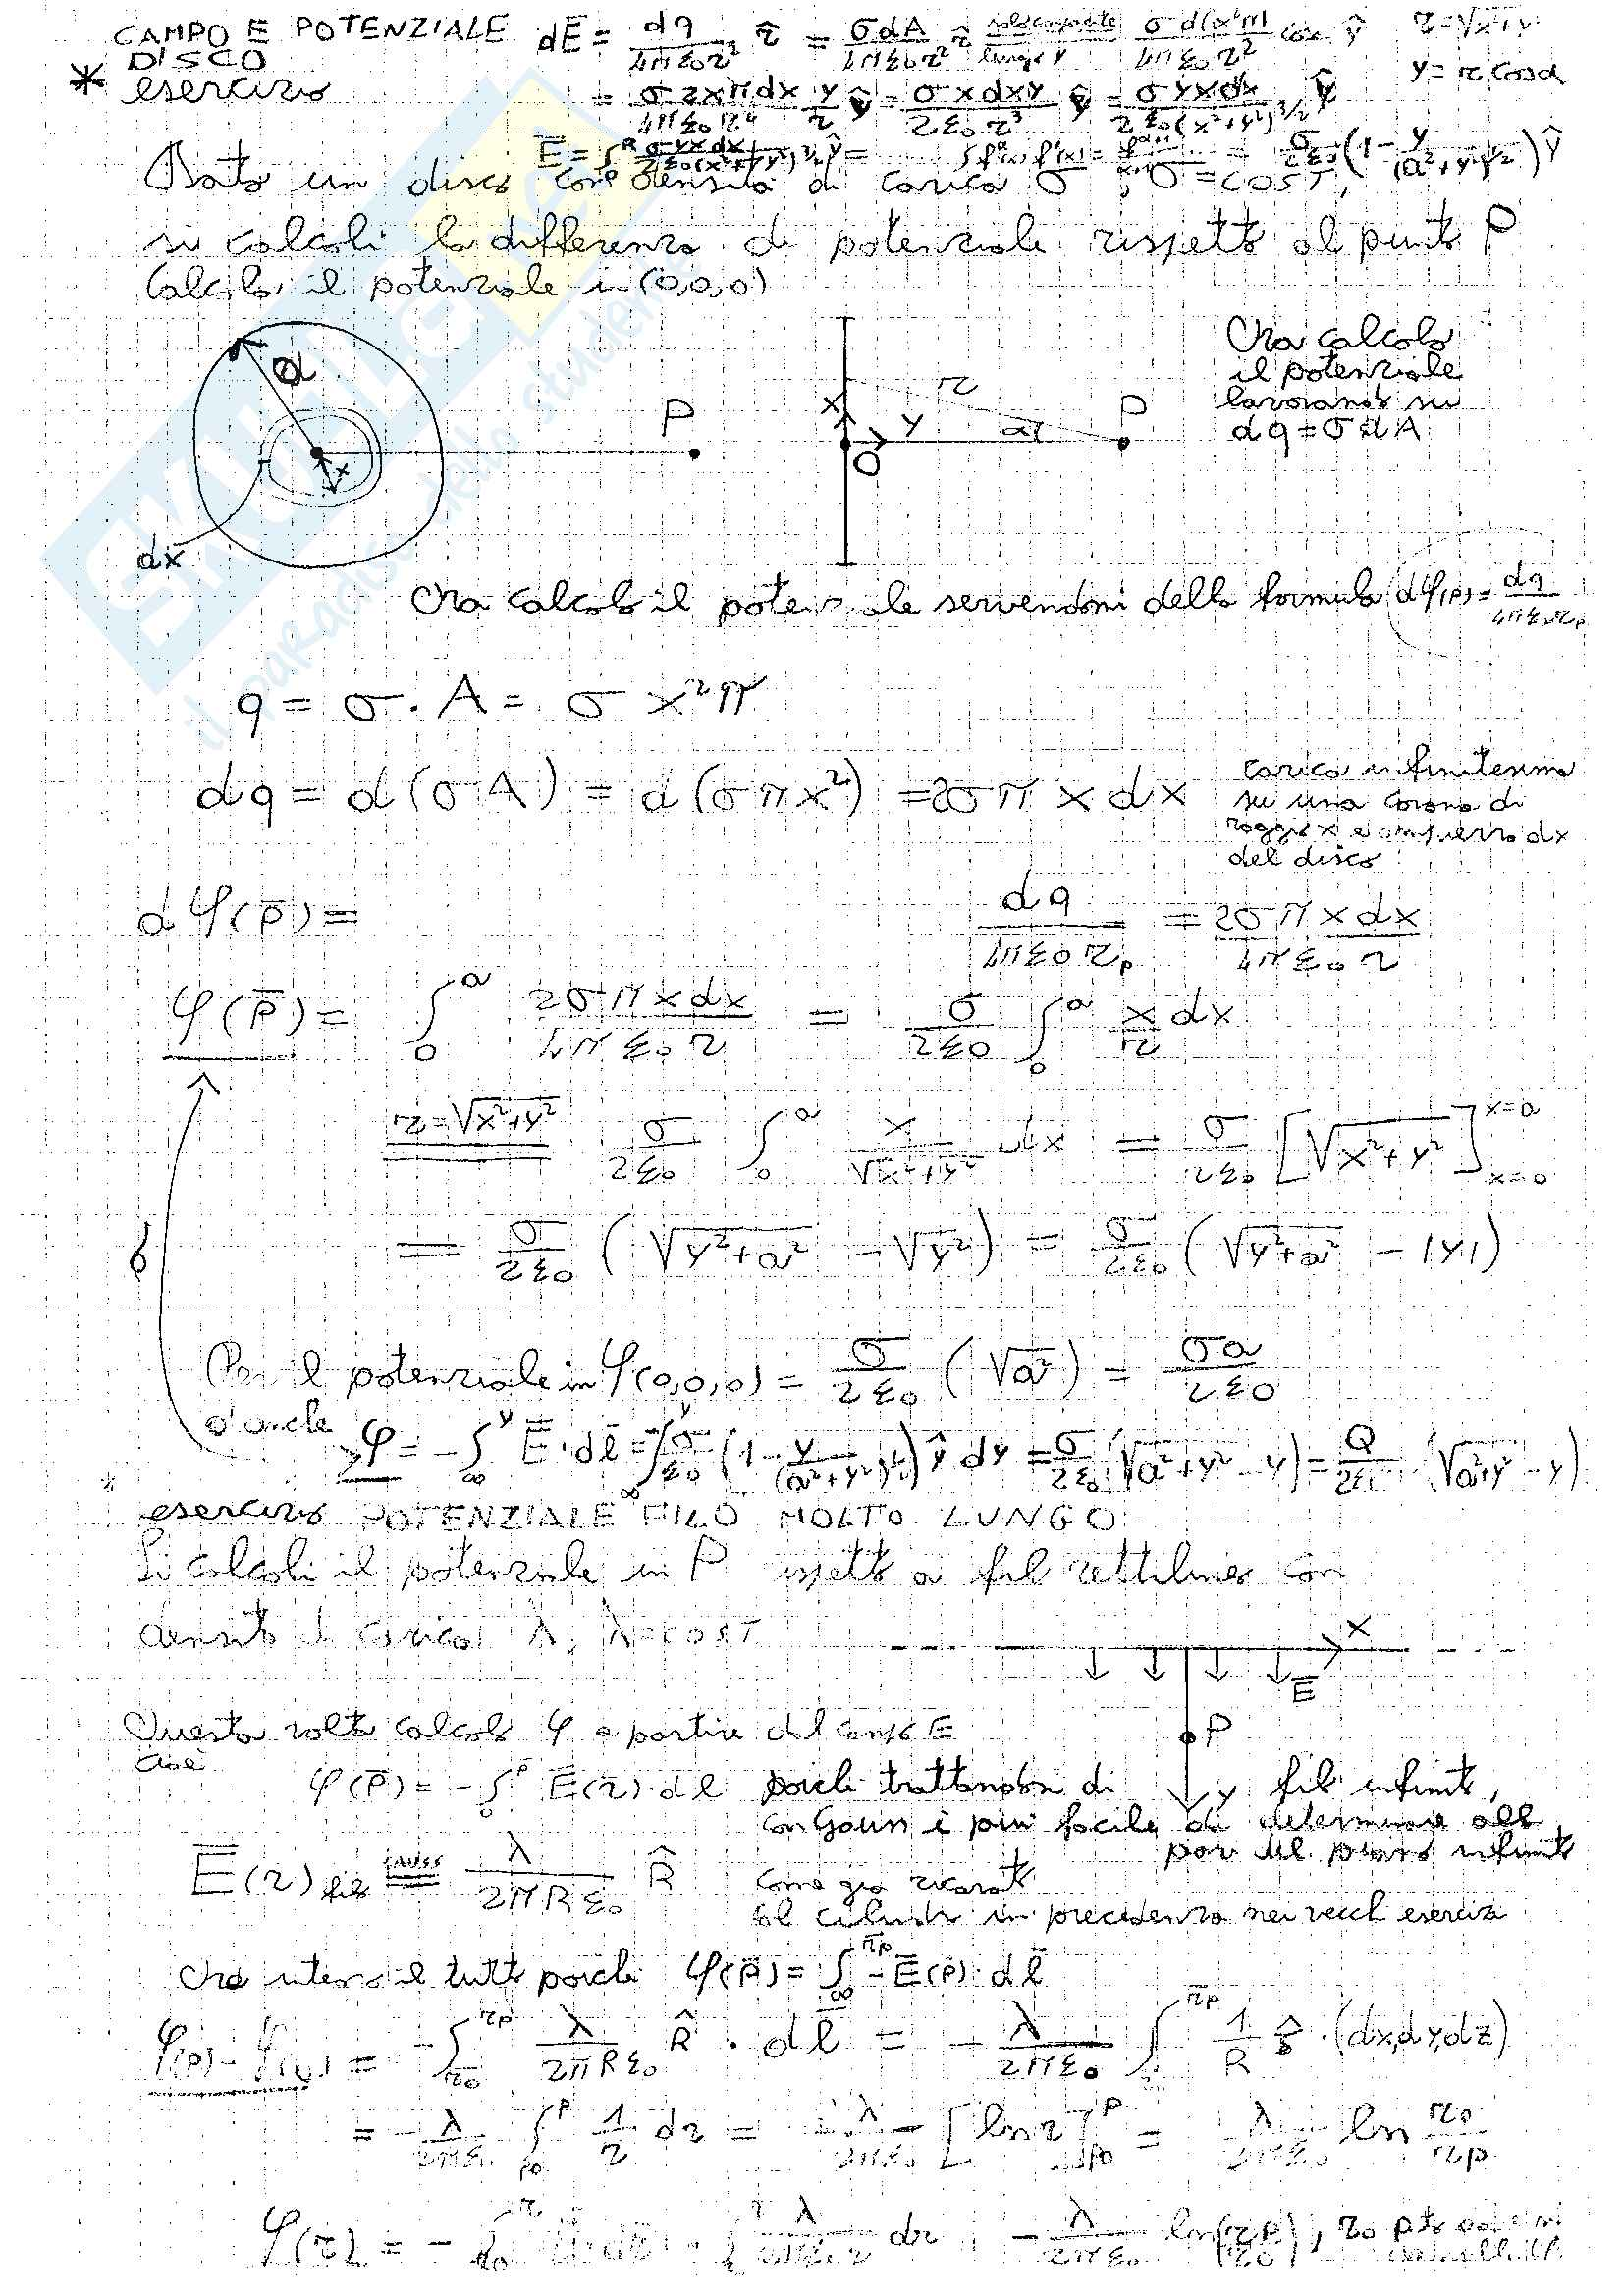 Fisica 2 - Appunti Pag. 26